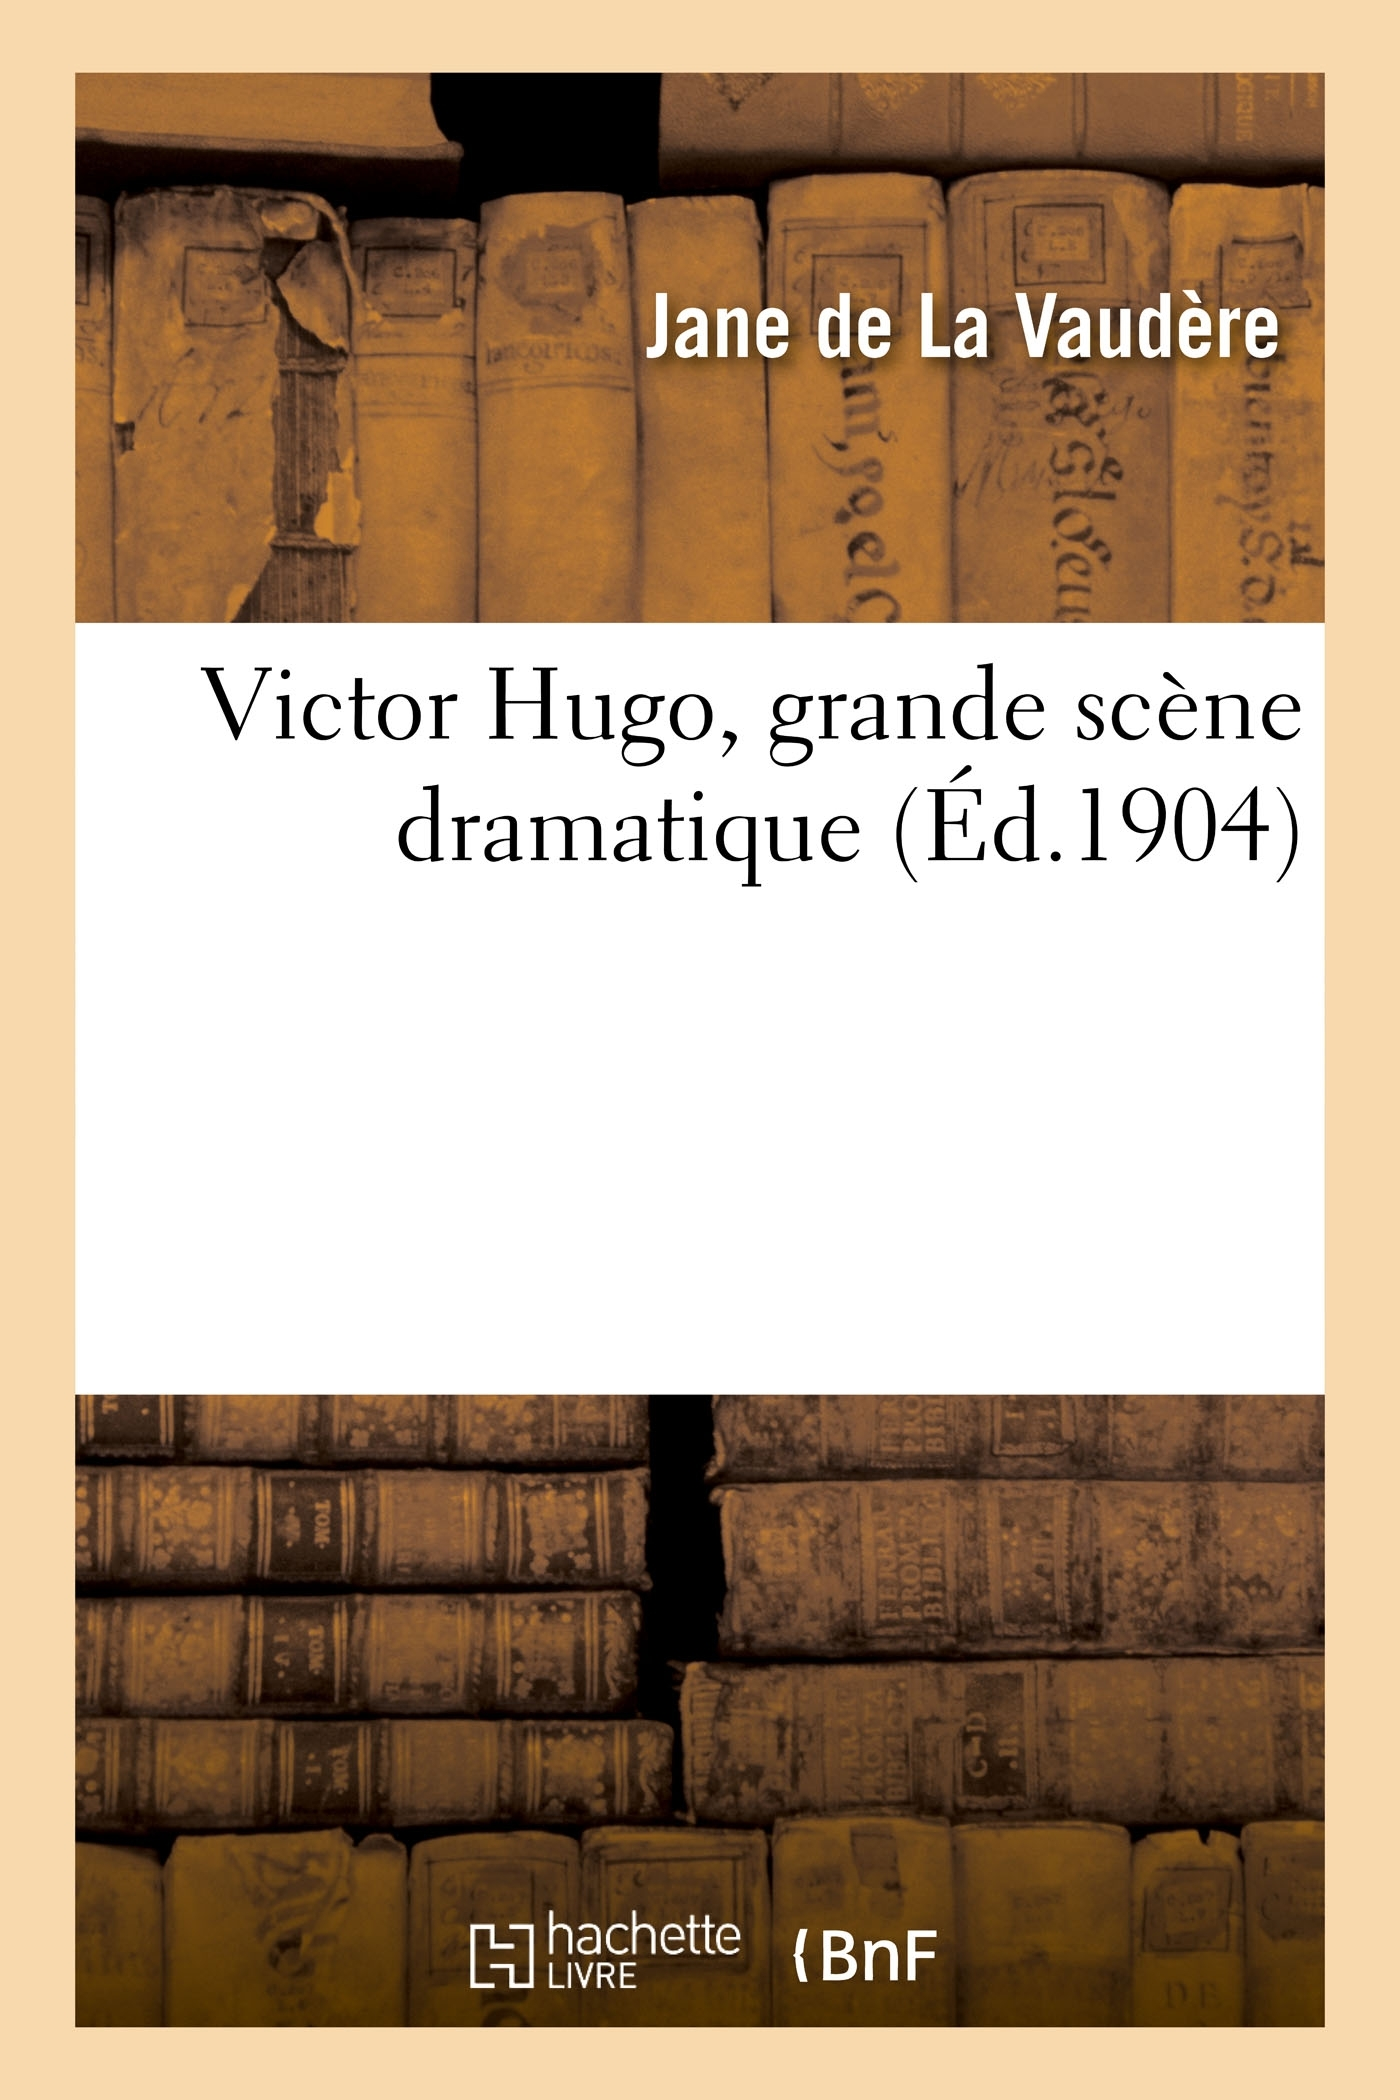 VICTOR HUGO, GRANDE SCENE DRAMATIQUE